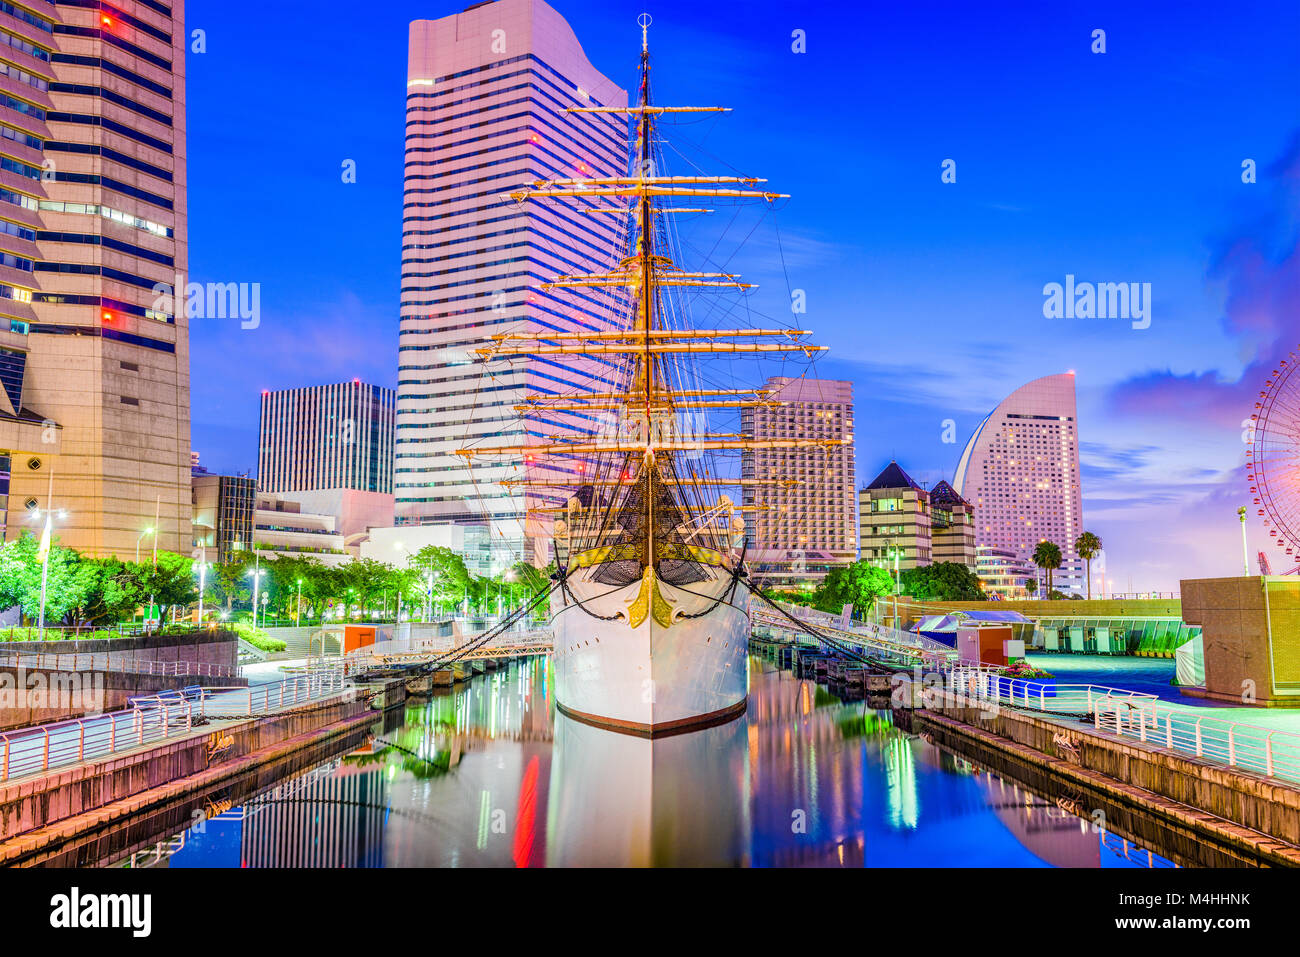 Yokohama, Japan cityscape and harbor at dusk. - Stock Image